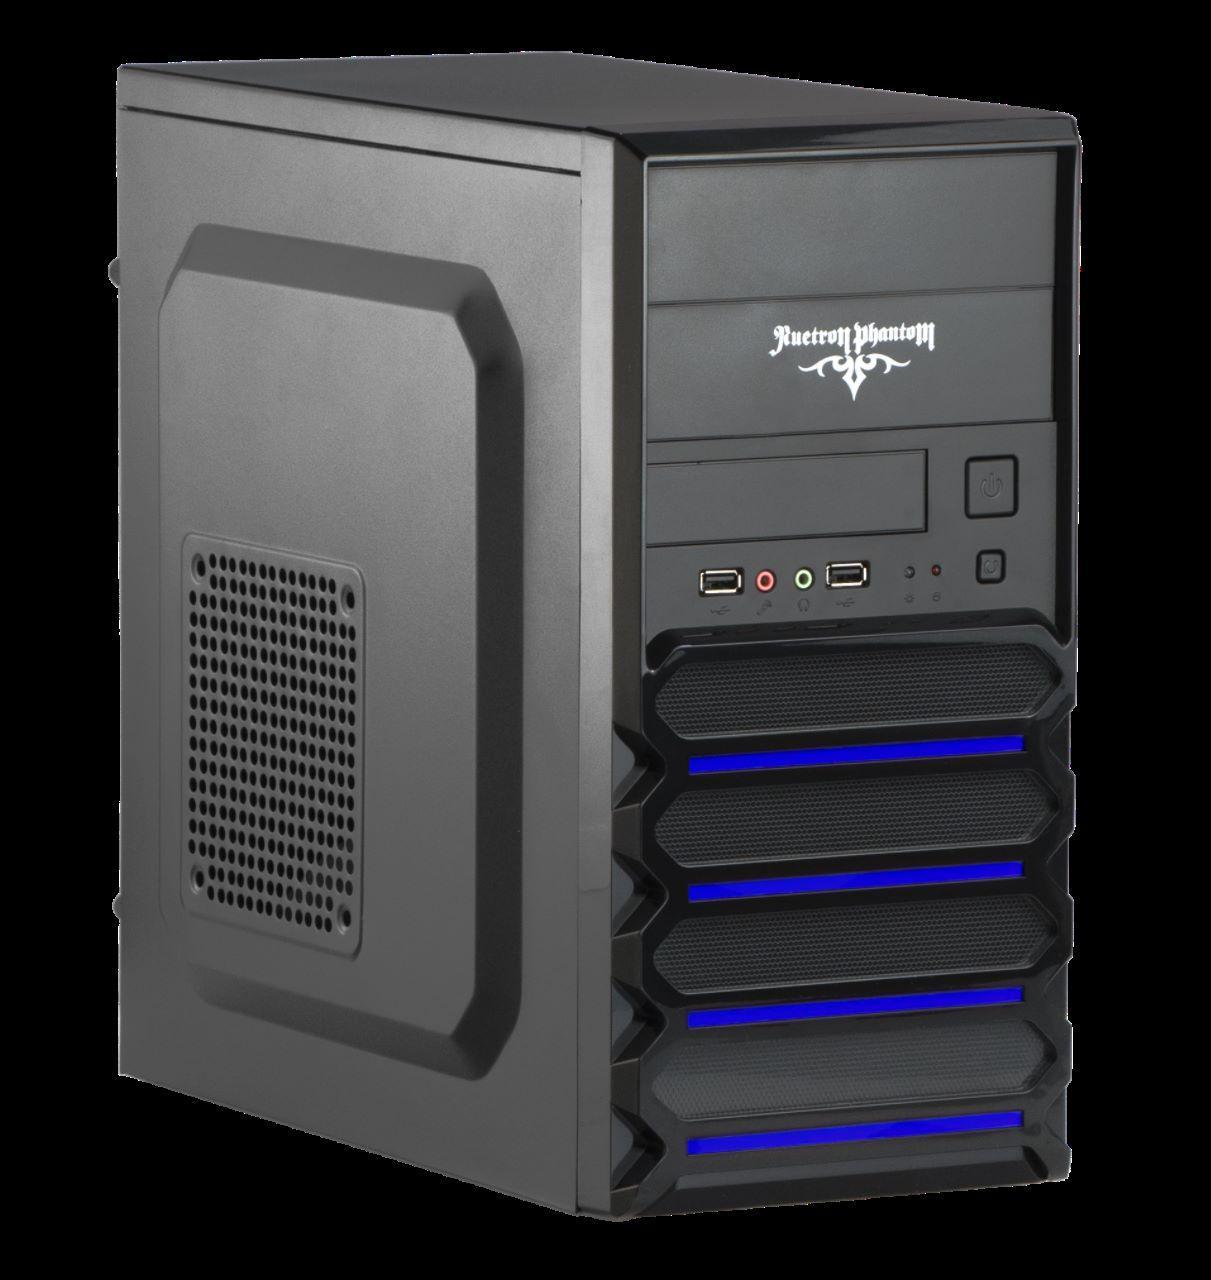 Intel Pc Philippines Desktop Computers For Sale Prices Pentium G4600 36ghz Kabylake Socket 1151 Pcx Basic Em2 Eig46004g 4gb 500gb Win10 Blue